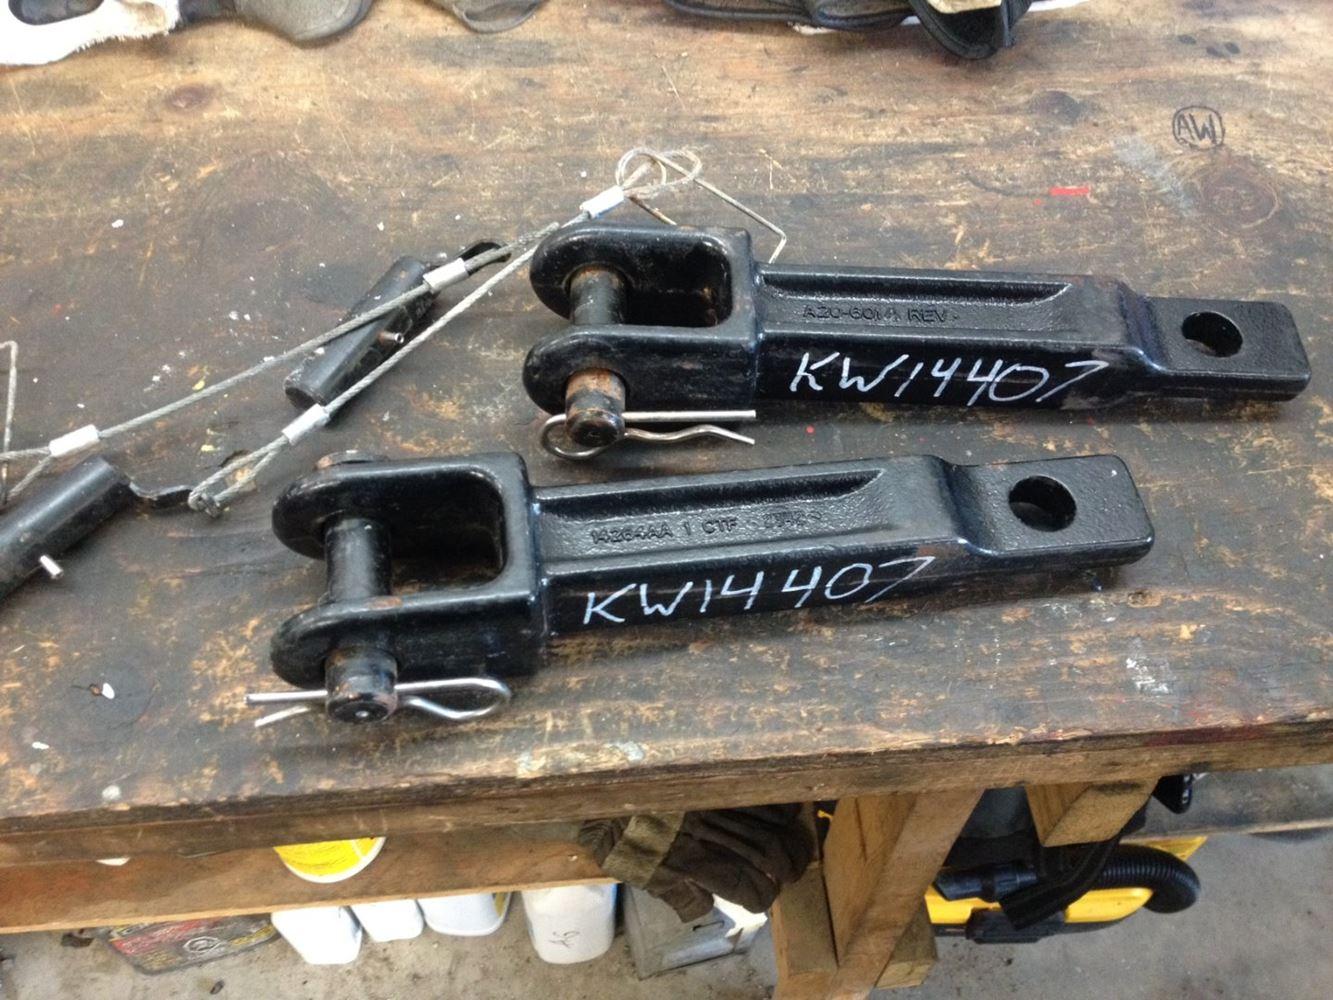 2014 Kenworth T660 (Stock #KW14407-19) | Miscellaneous | TPI